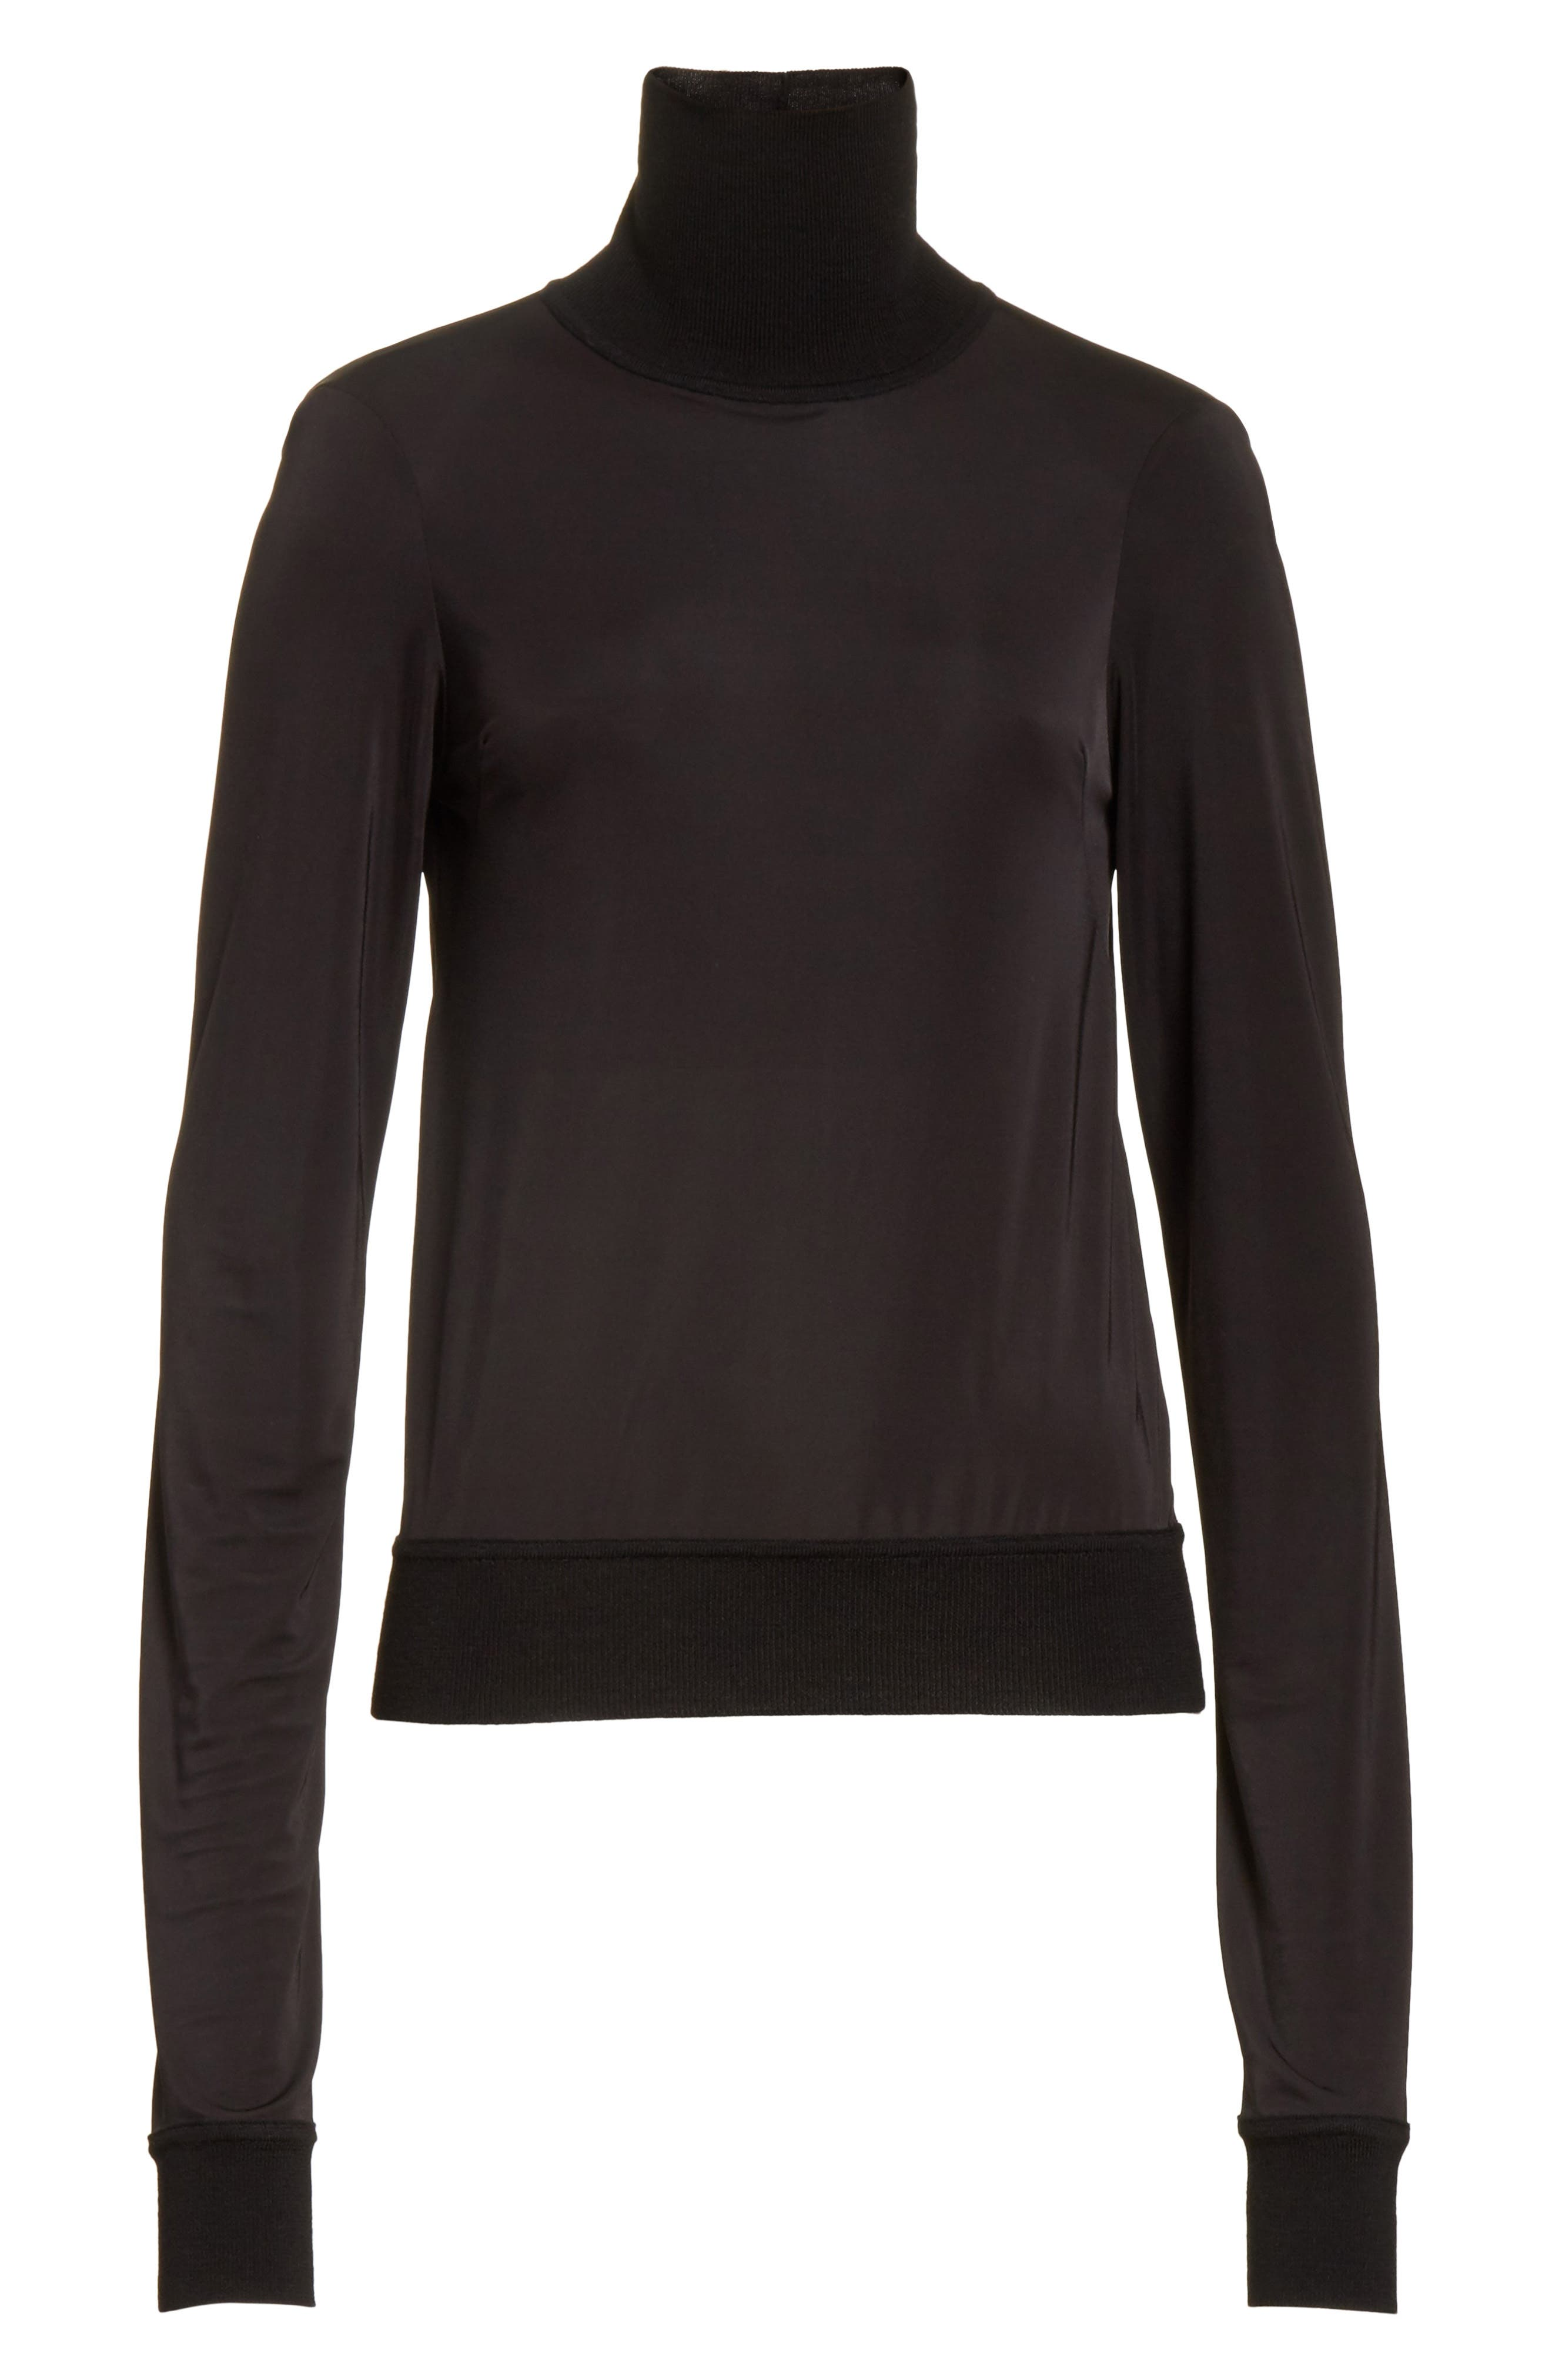 Merino Trim Turtleneck Sweater,                             Alternate thumbnail 6, color,                             001